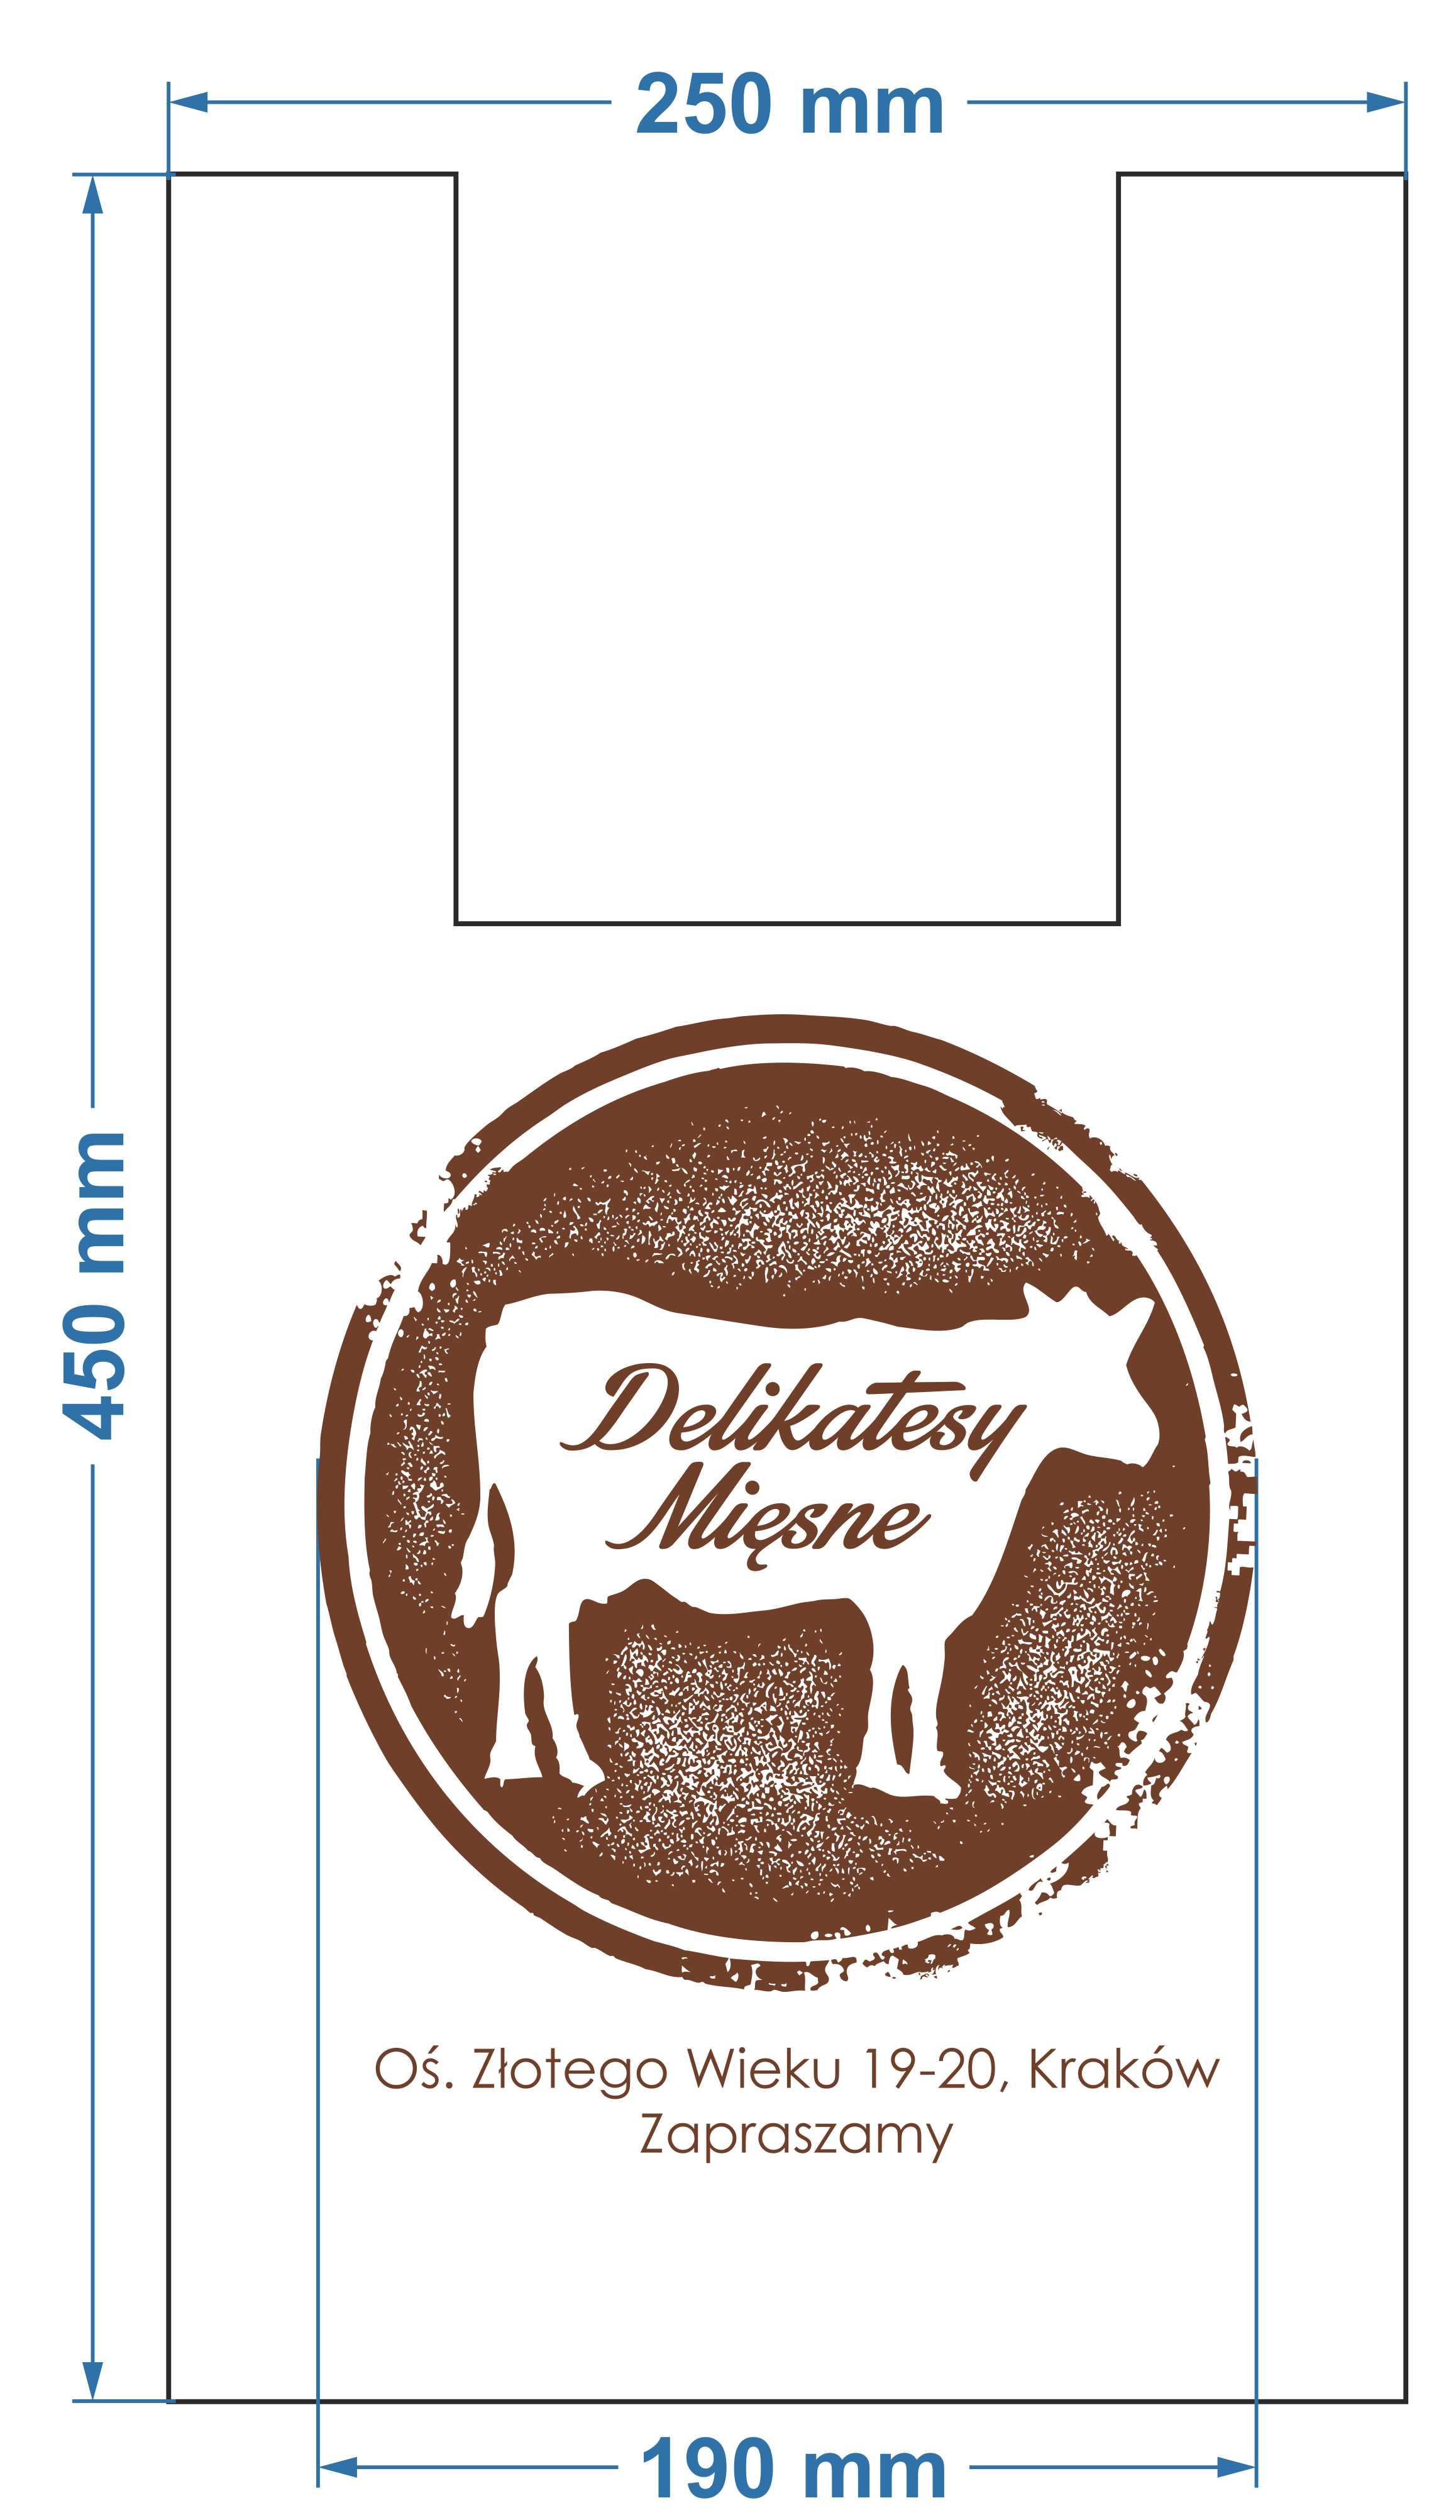 reklamówki_delikatesy_mięsne